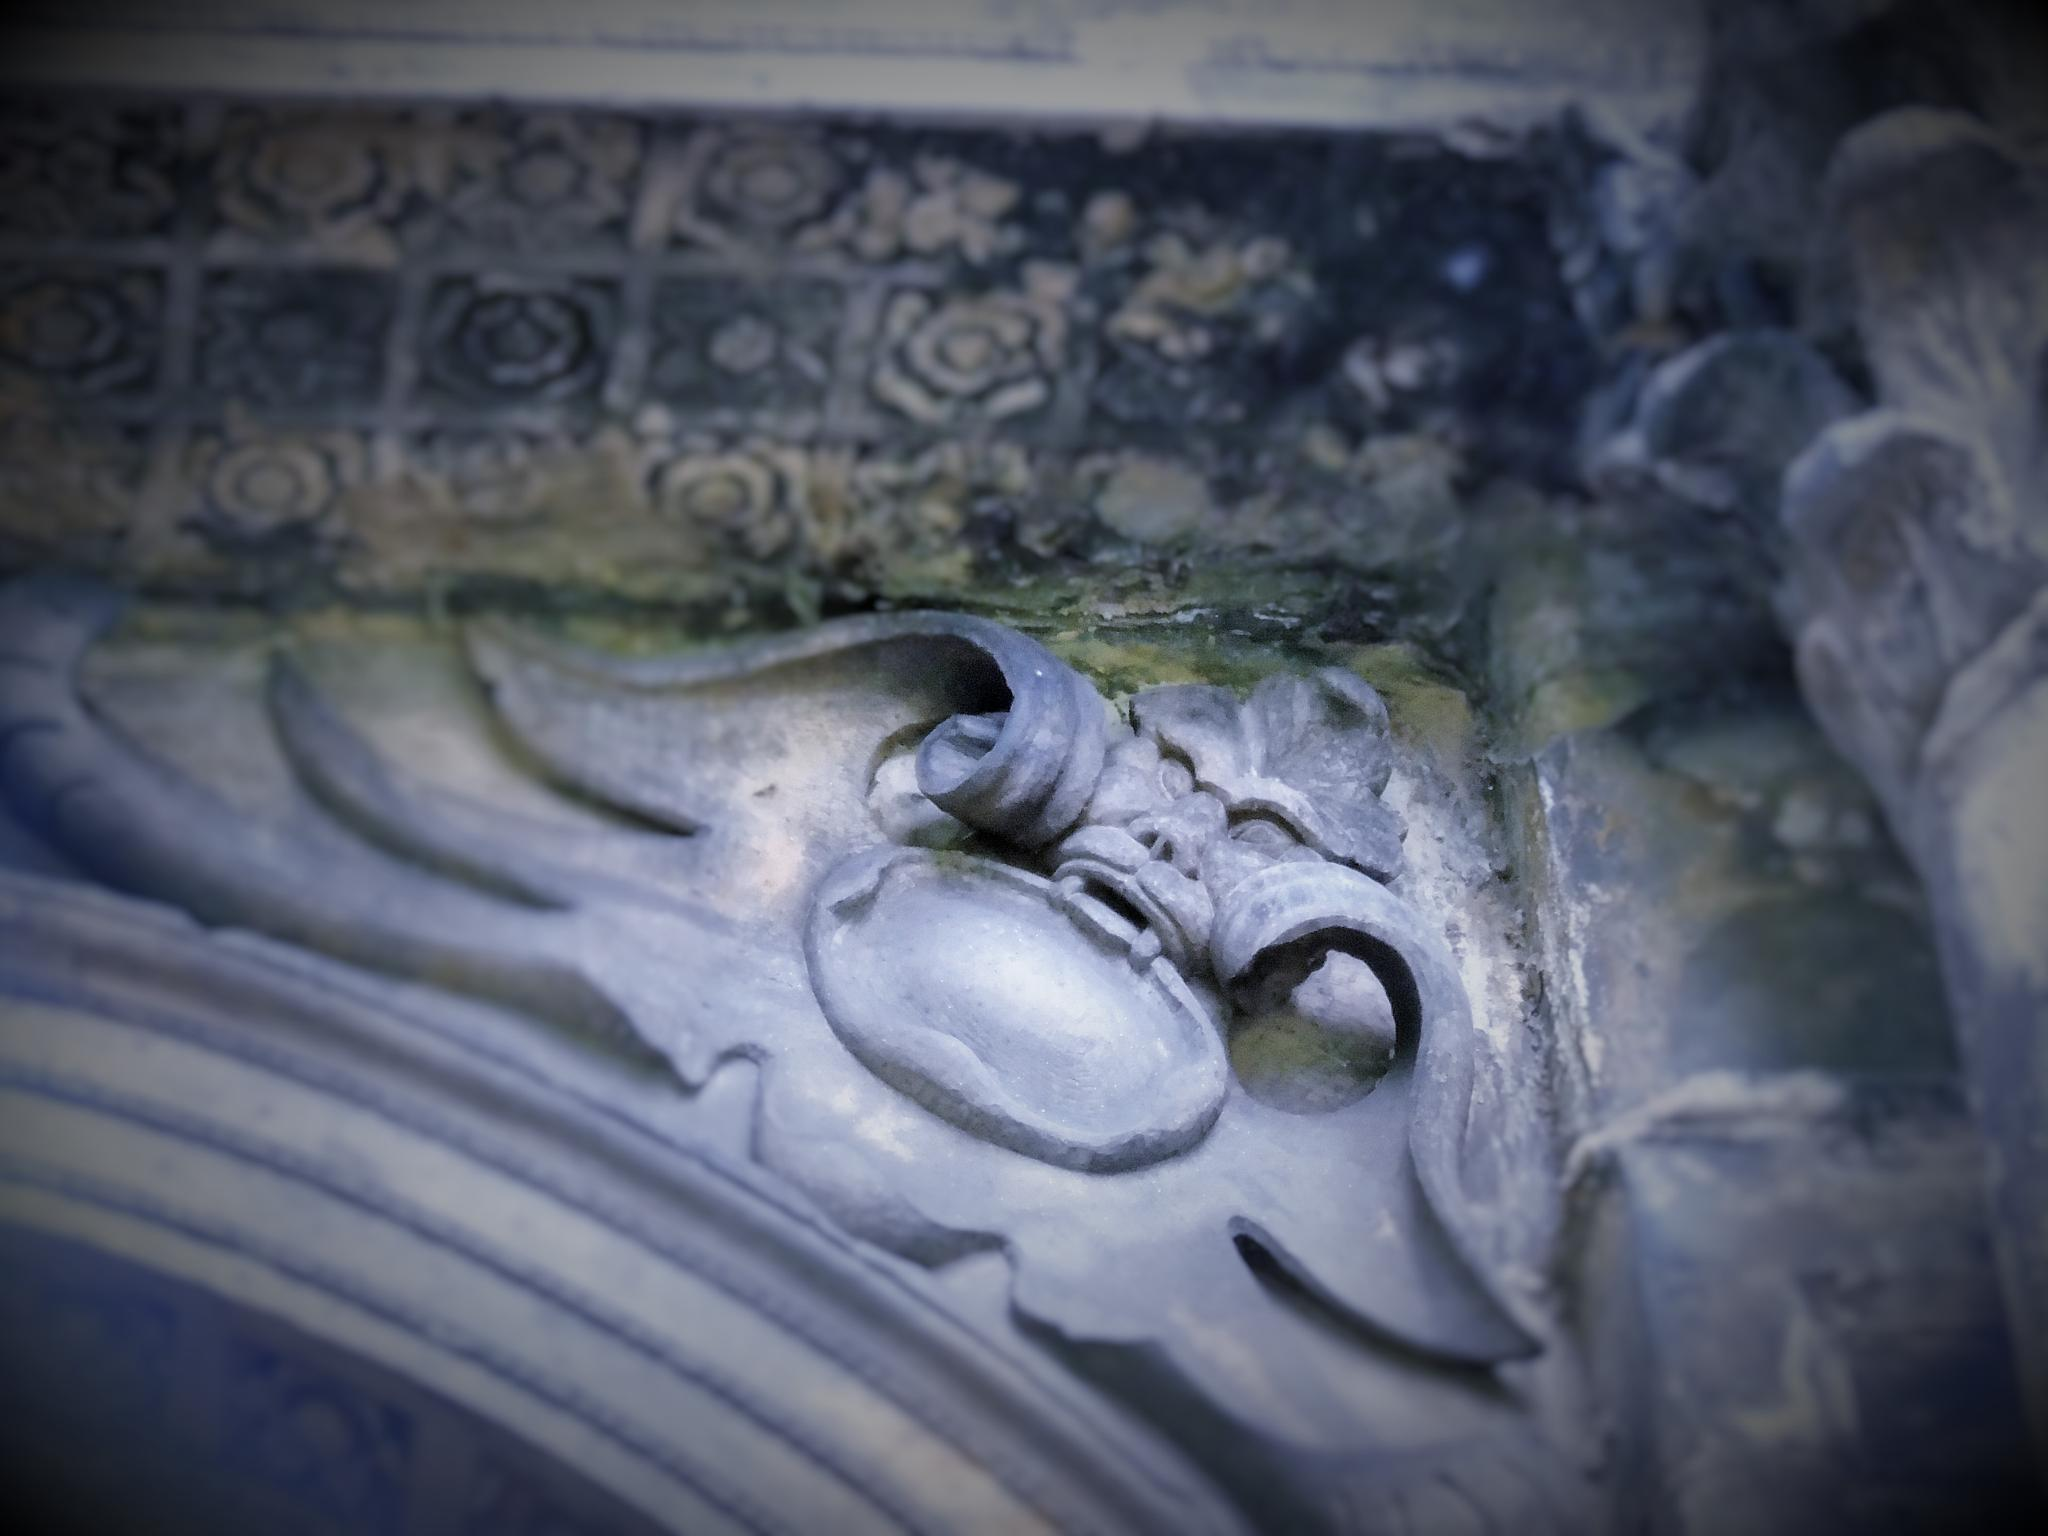 Greyfriars kirk yard grave stone by jakky1971